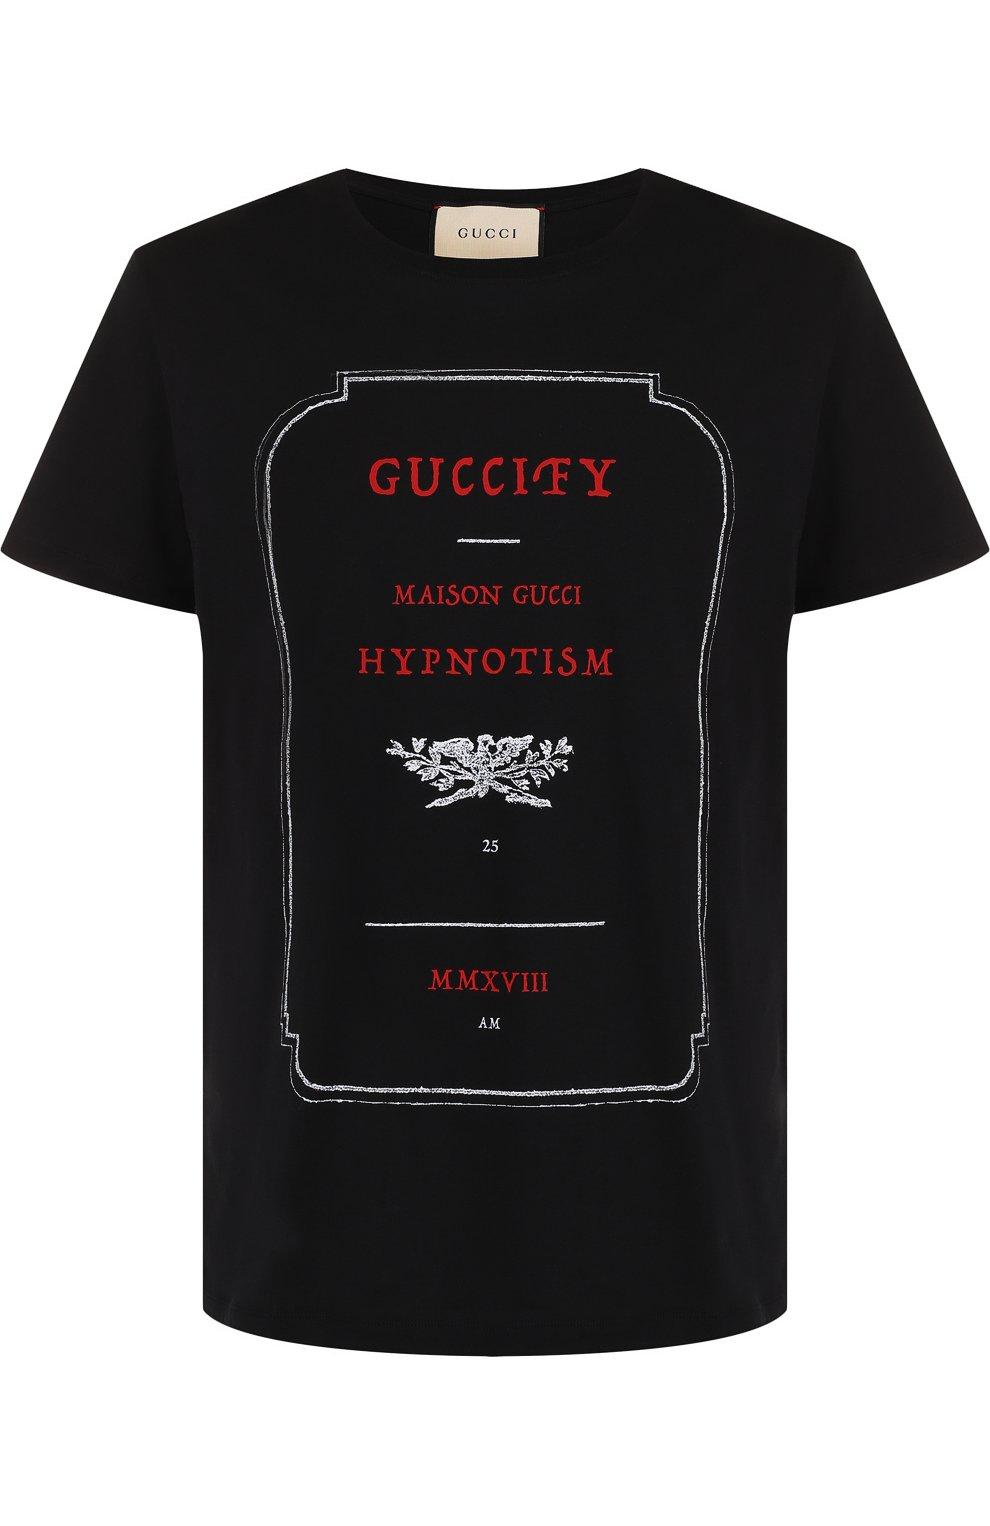 3b2081422fed Мужские футболки Gucci по цене от 23 000 руб. купить в интернет-магазине ЦУМ